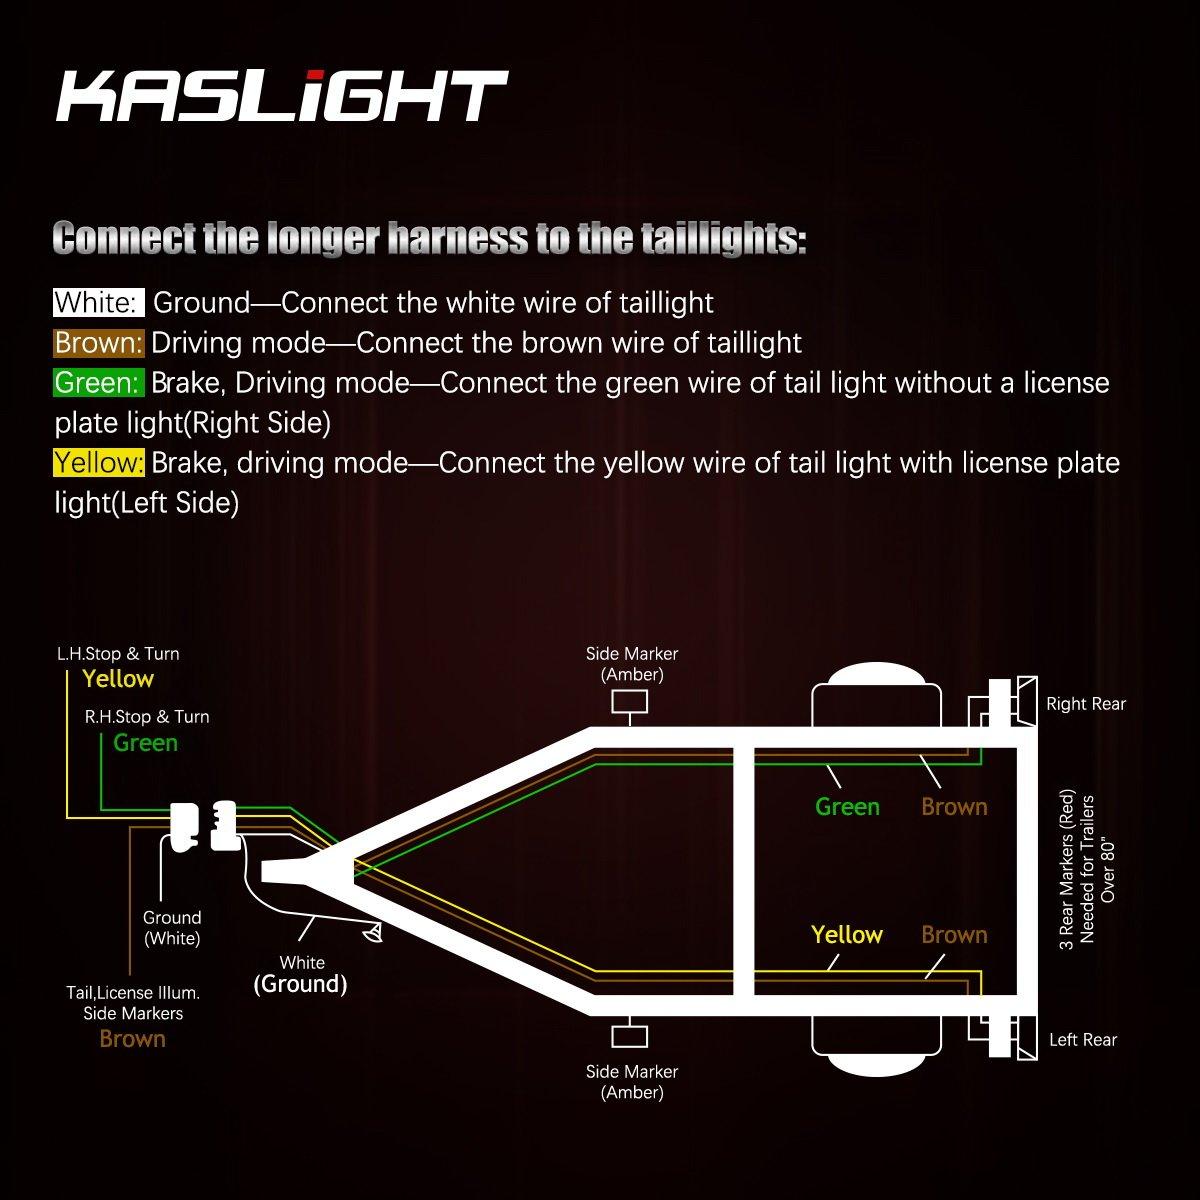 Kaslight Boat Trailer Lights Marine Wiring Harness Converter Box Waterproof Ip68 12v Led Submersible Tail Light Kit